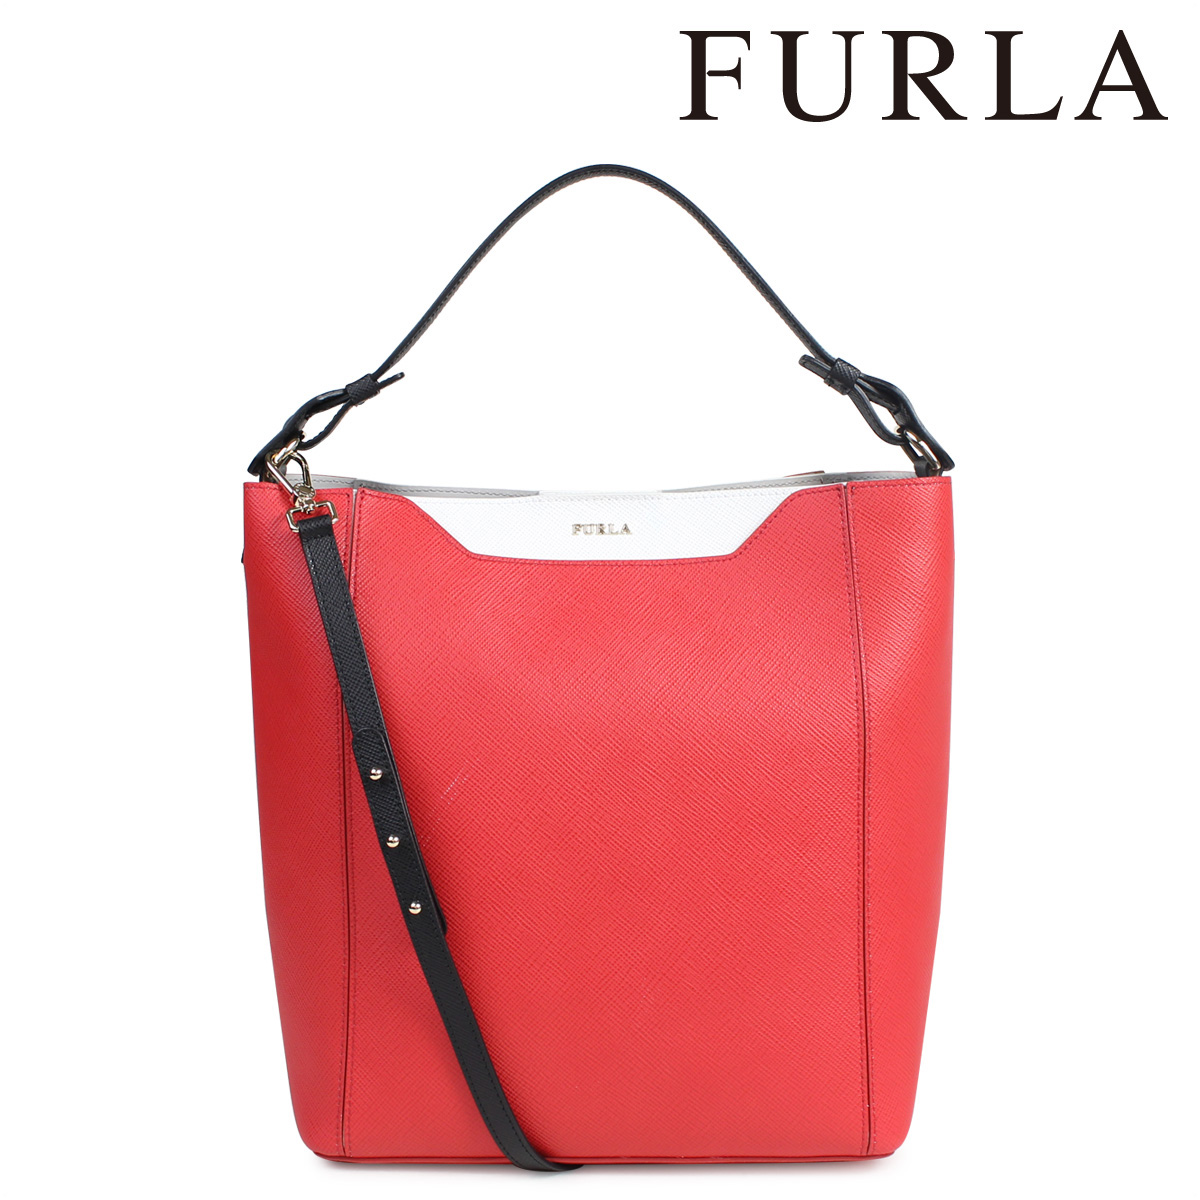 FURLA フルラ バッグ ショルダー ハンドバッグ レディース レッド 赤 FANTASIA 800781